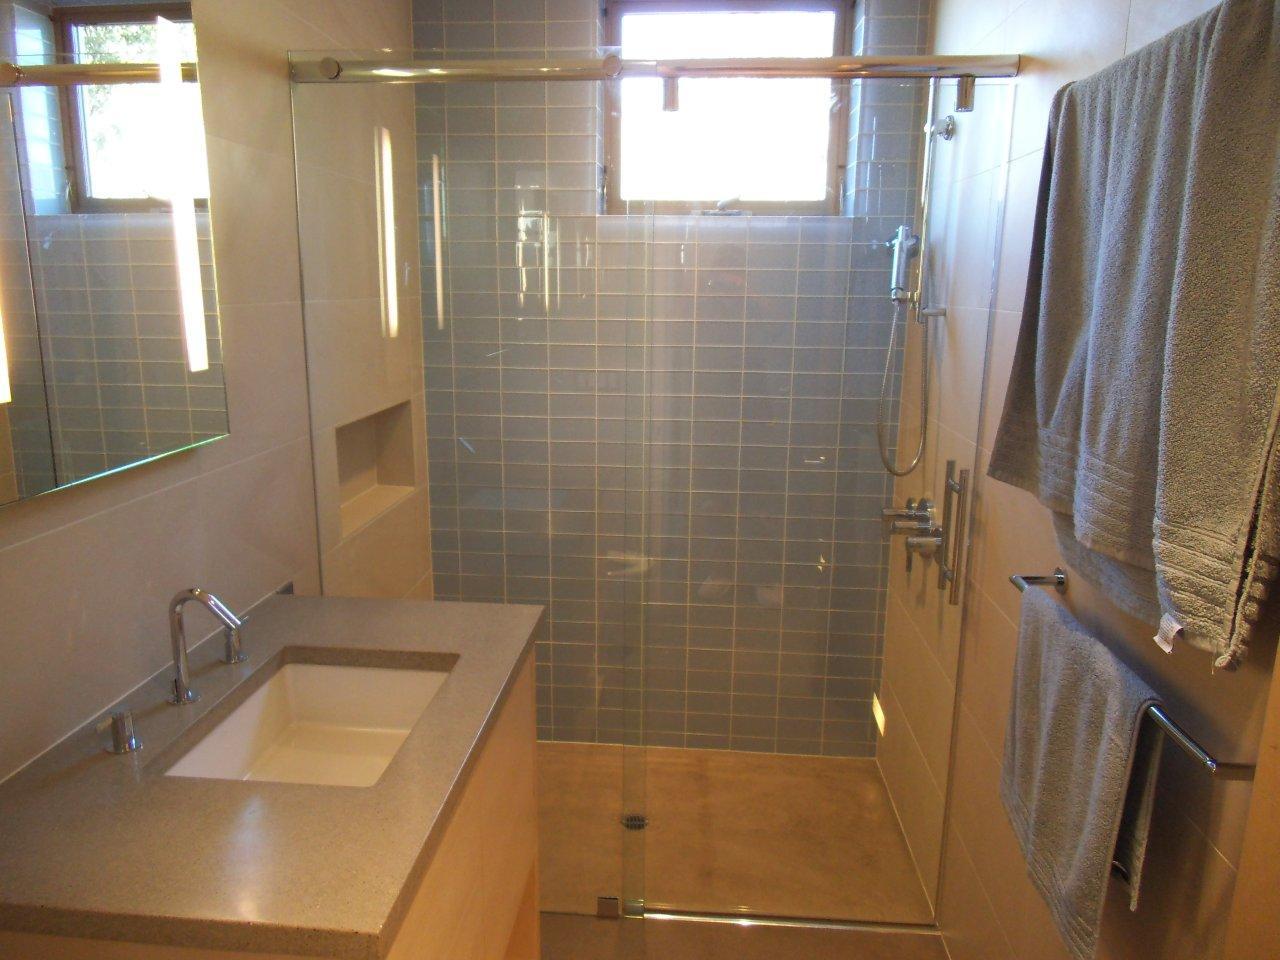 Home Depot Bathroom Project Ideas